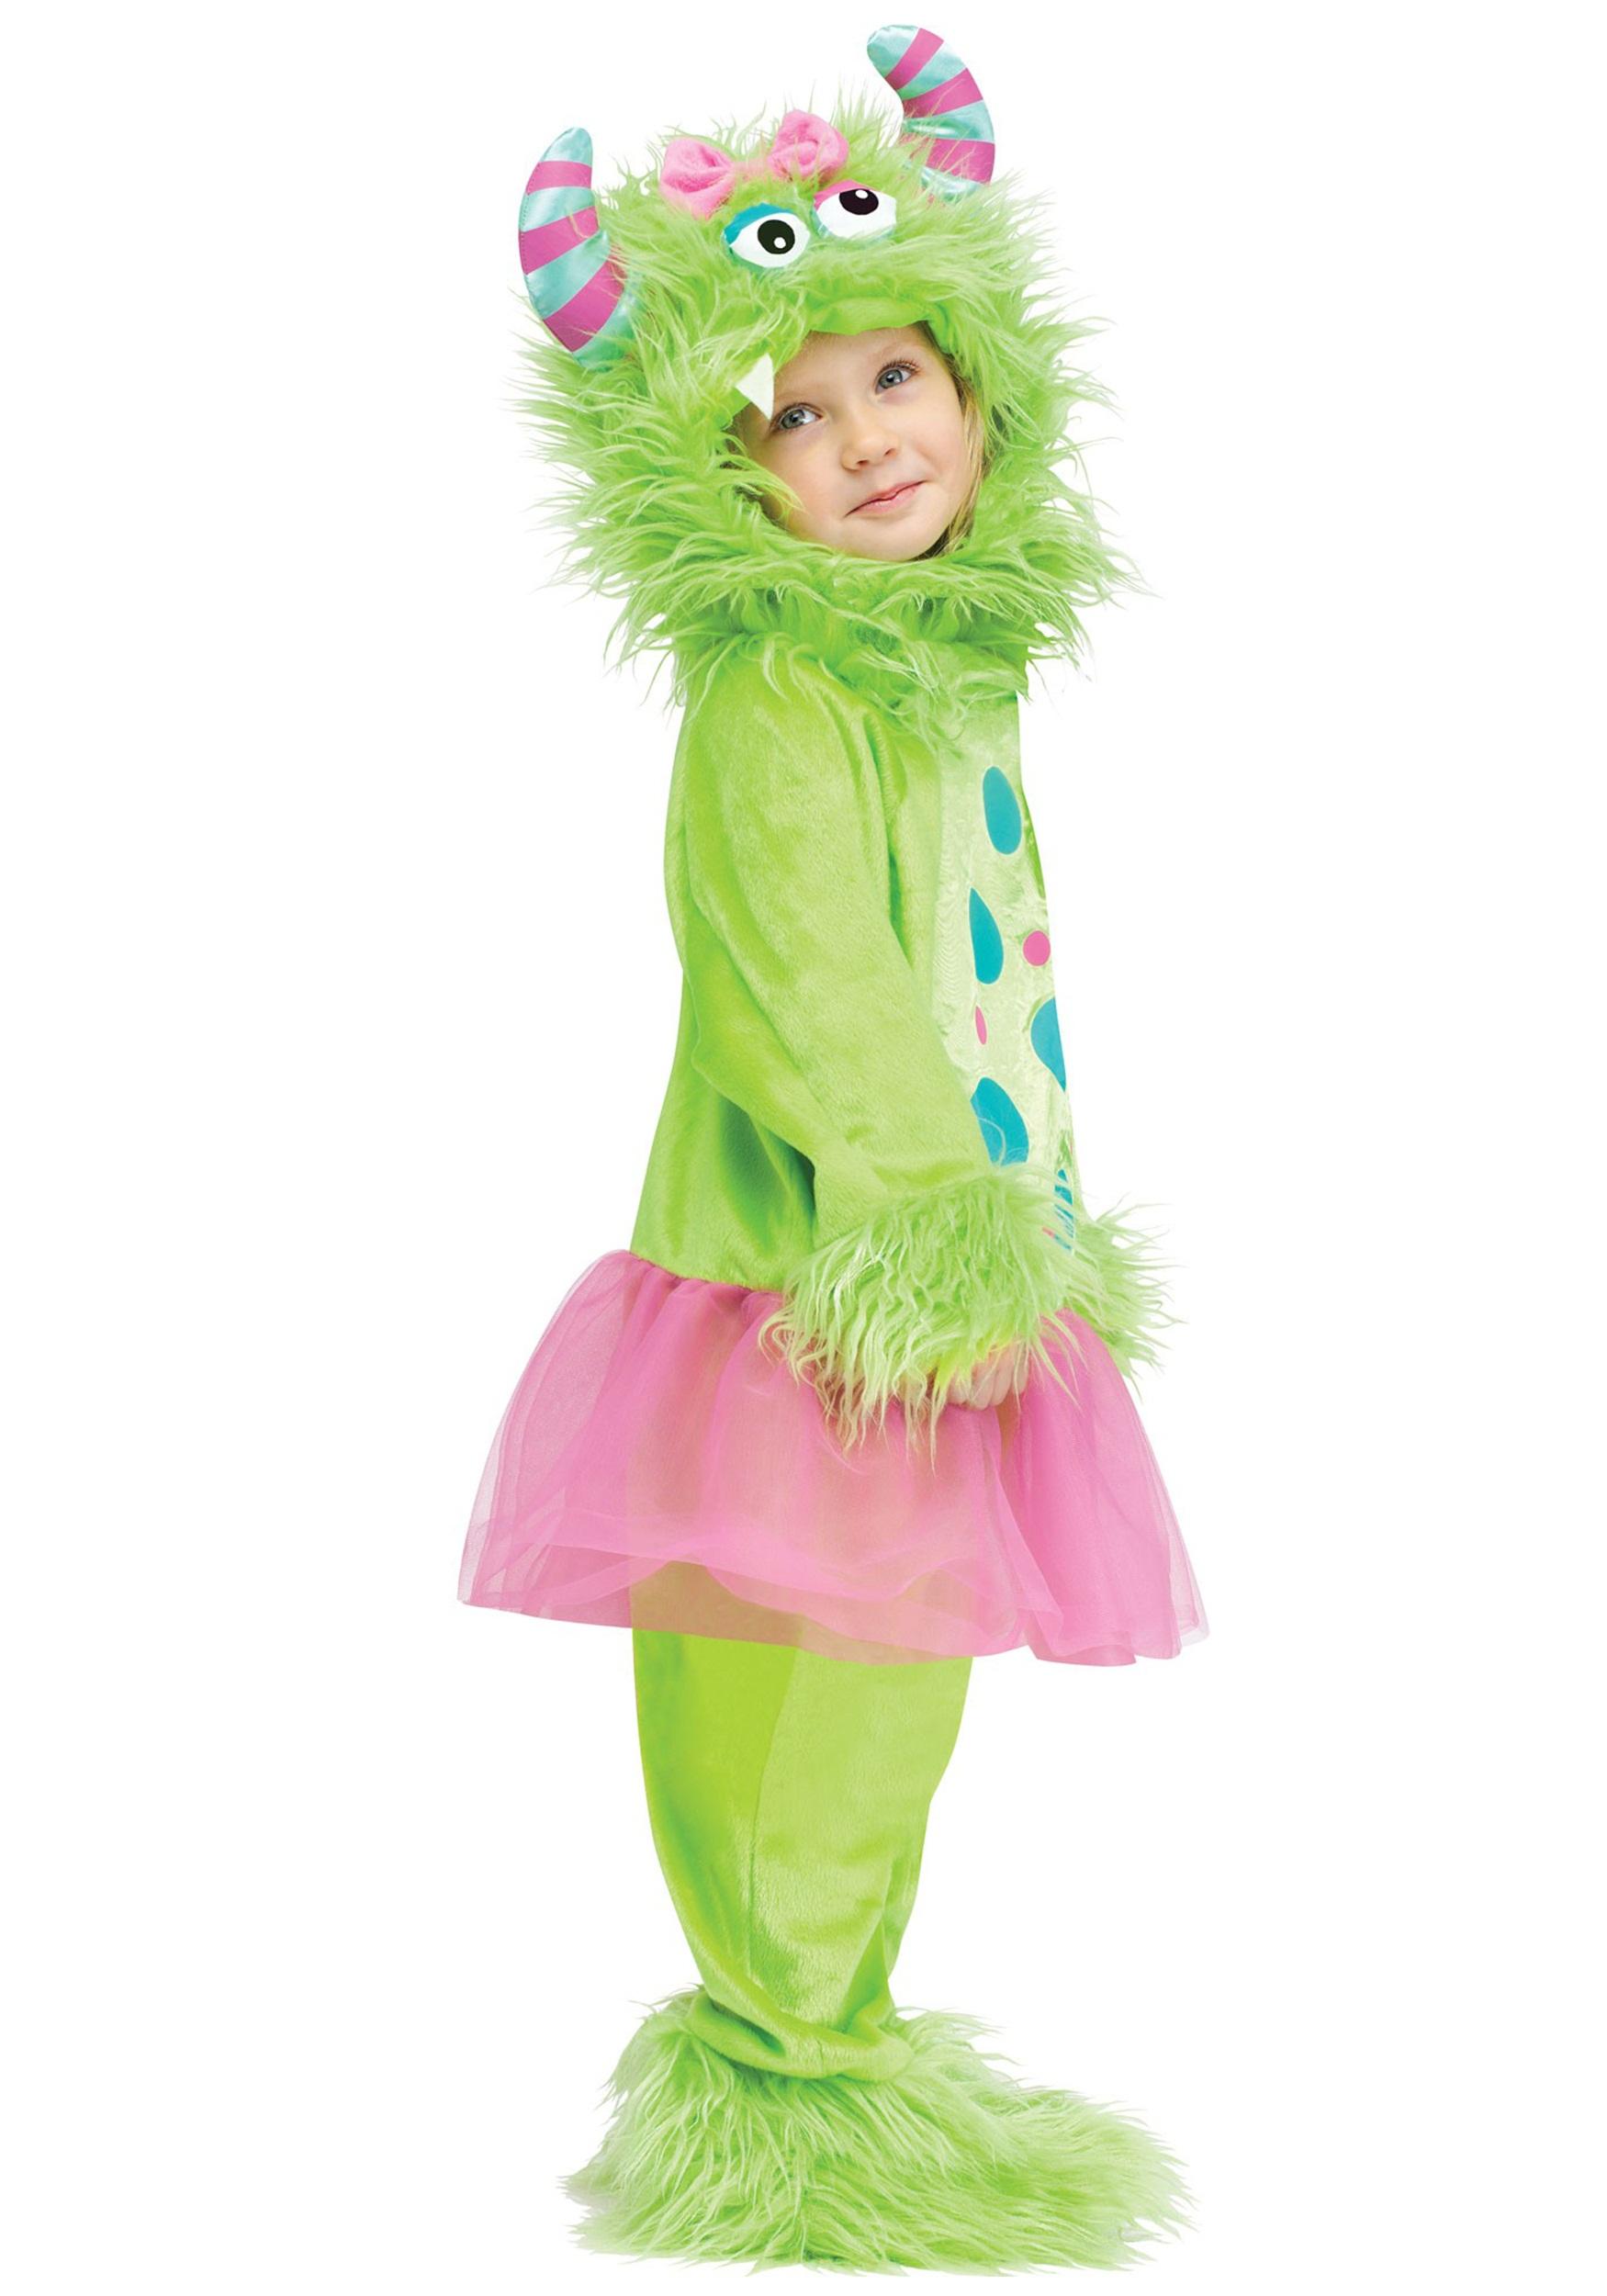 kids avengers girl iron man tutu costume source toddler terror in a tutu green costume halloween costumes